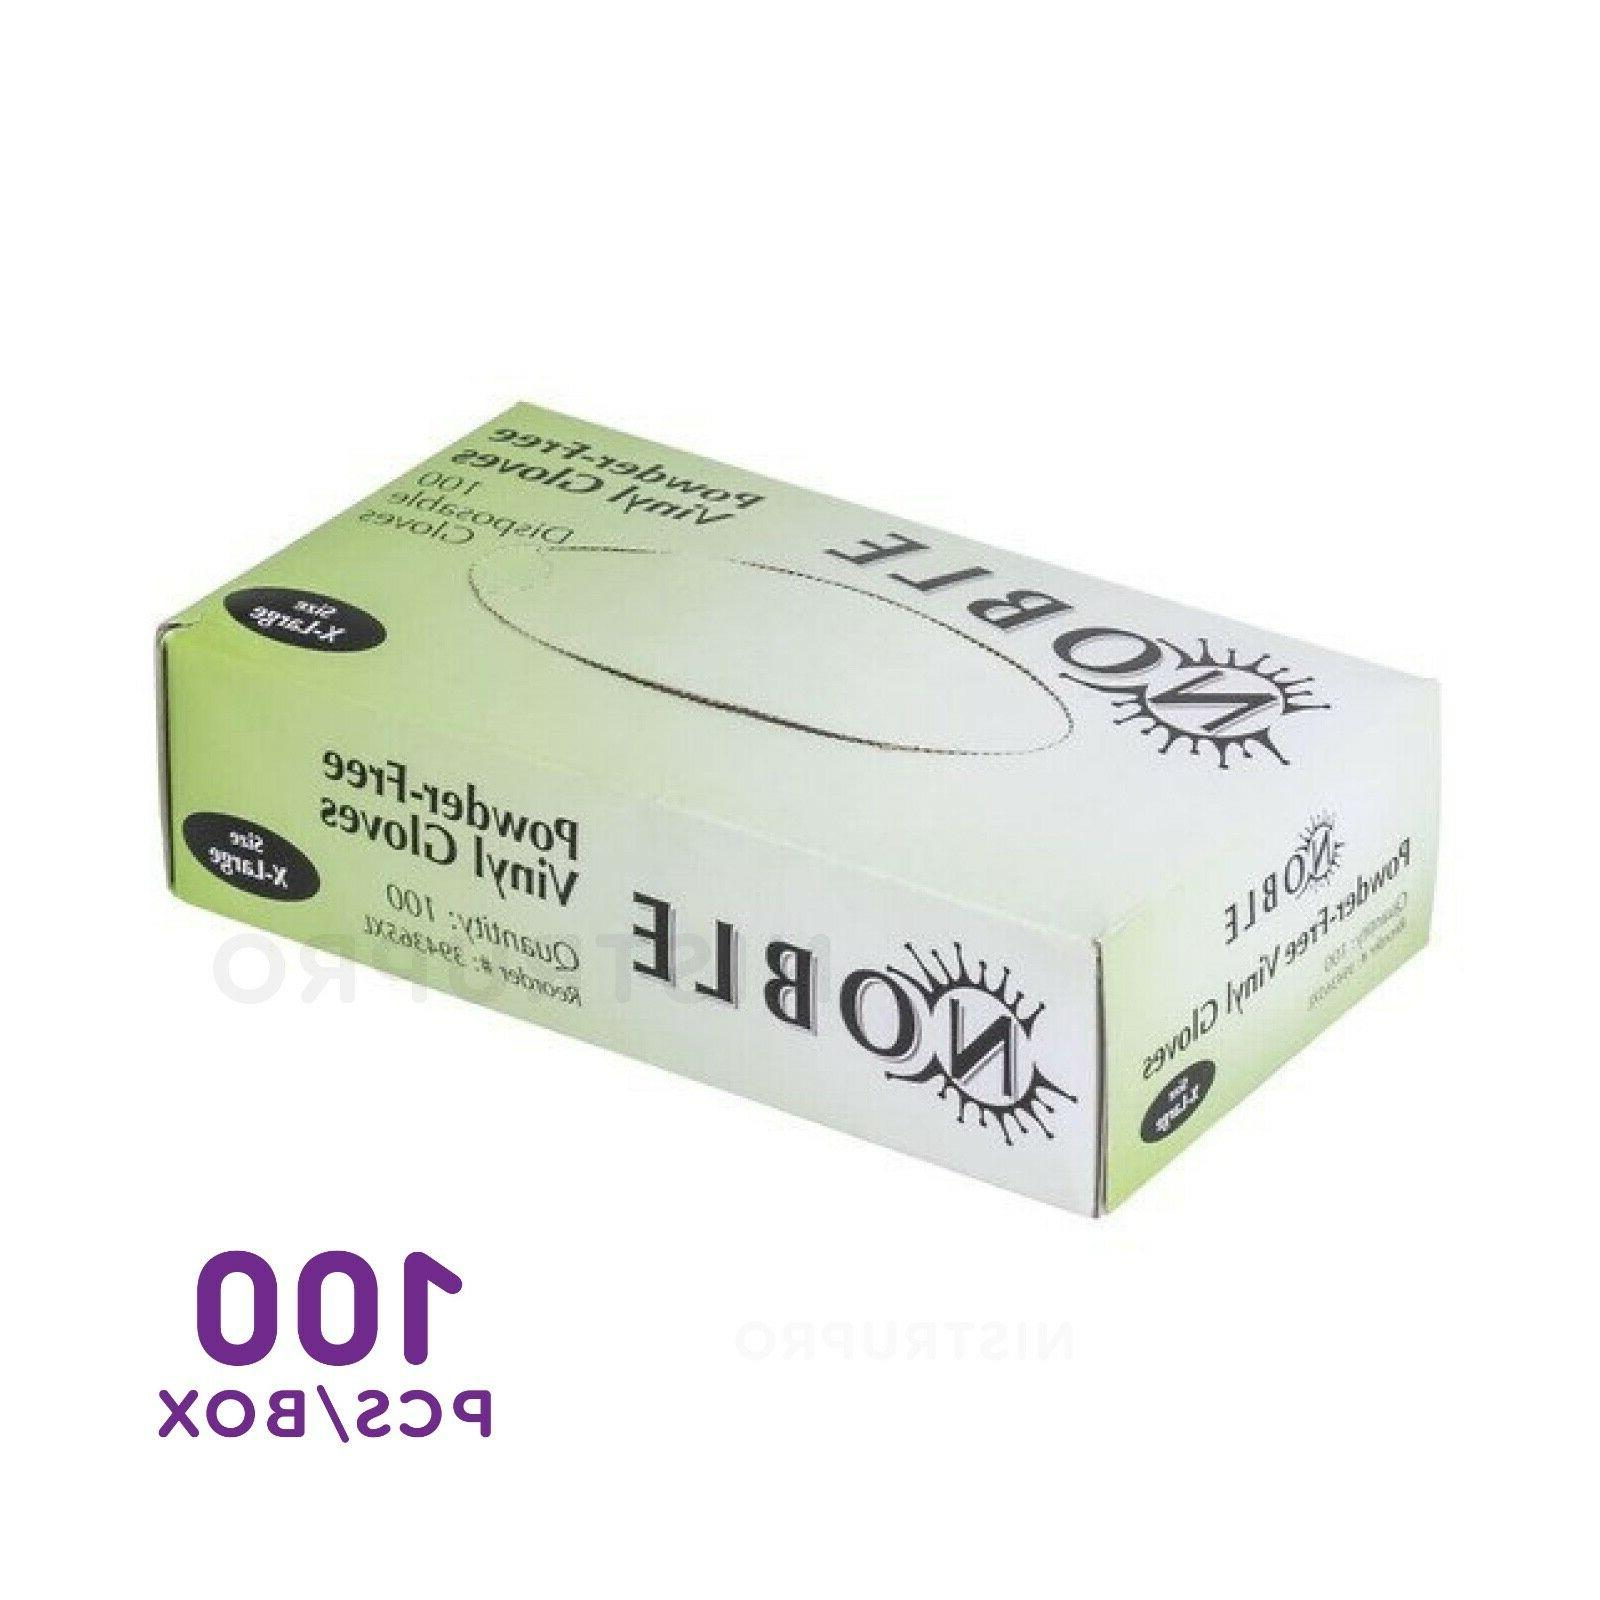 100 PCS BOX Latex-Free VINYL GLOVES MEDIUM, EXTRA